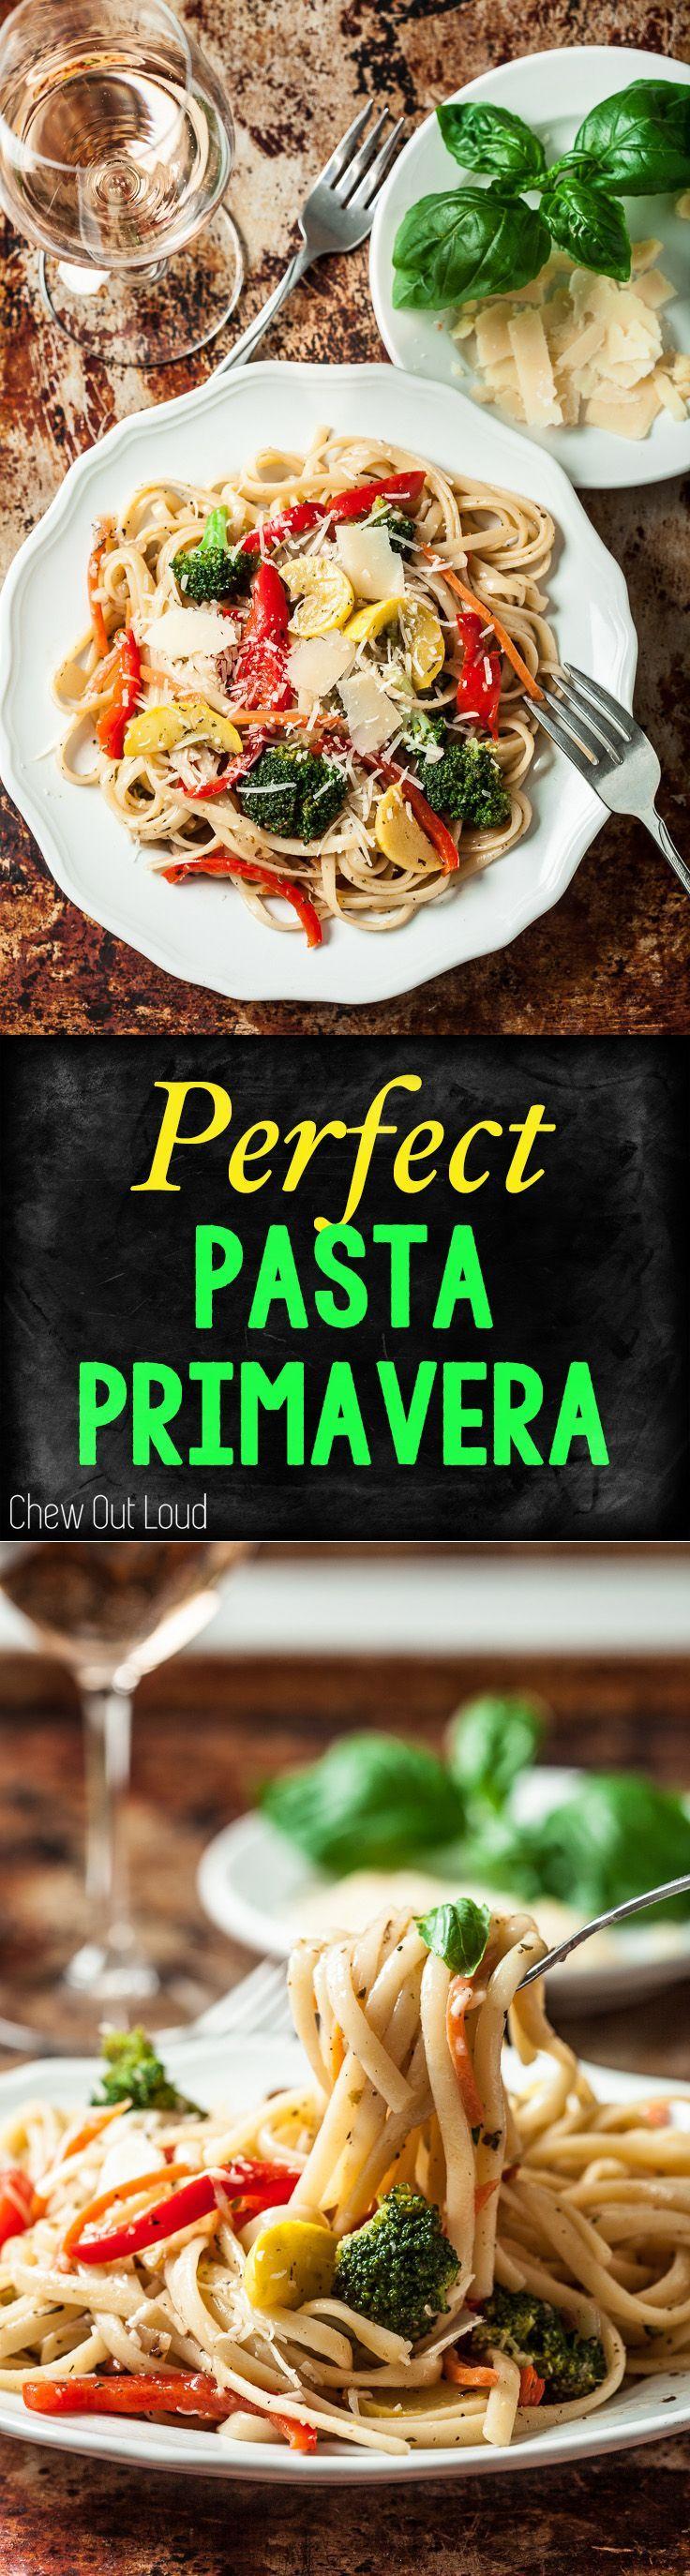 Fresh Pasta Primavera. Healthy, clean, lean, and delicious. Colorful spring and summer vegetables in one dish. #pasta #spaghetti #primavera www.chewoutloud.com